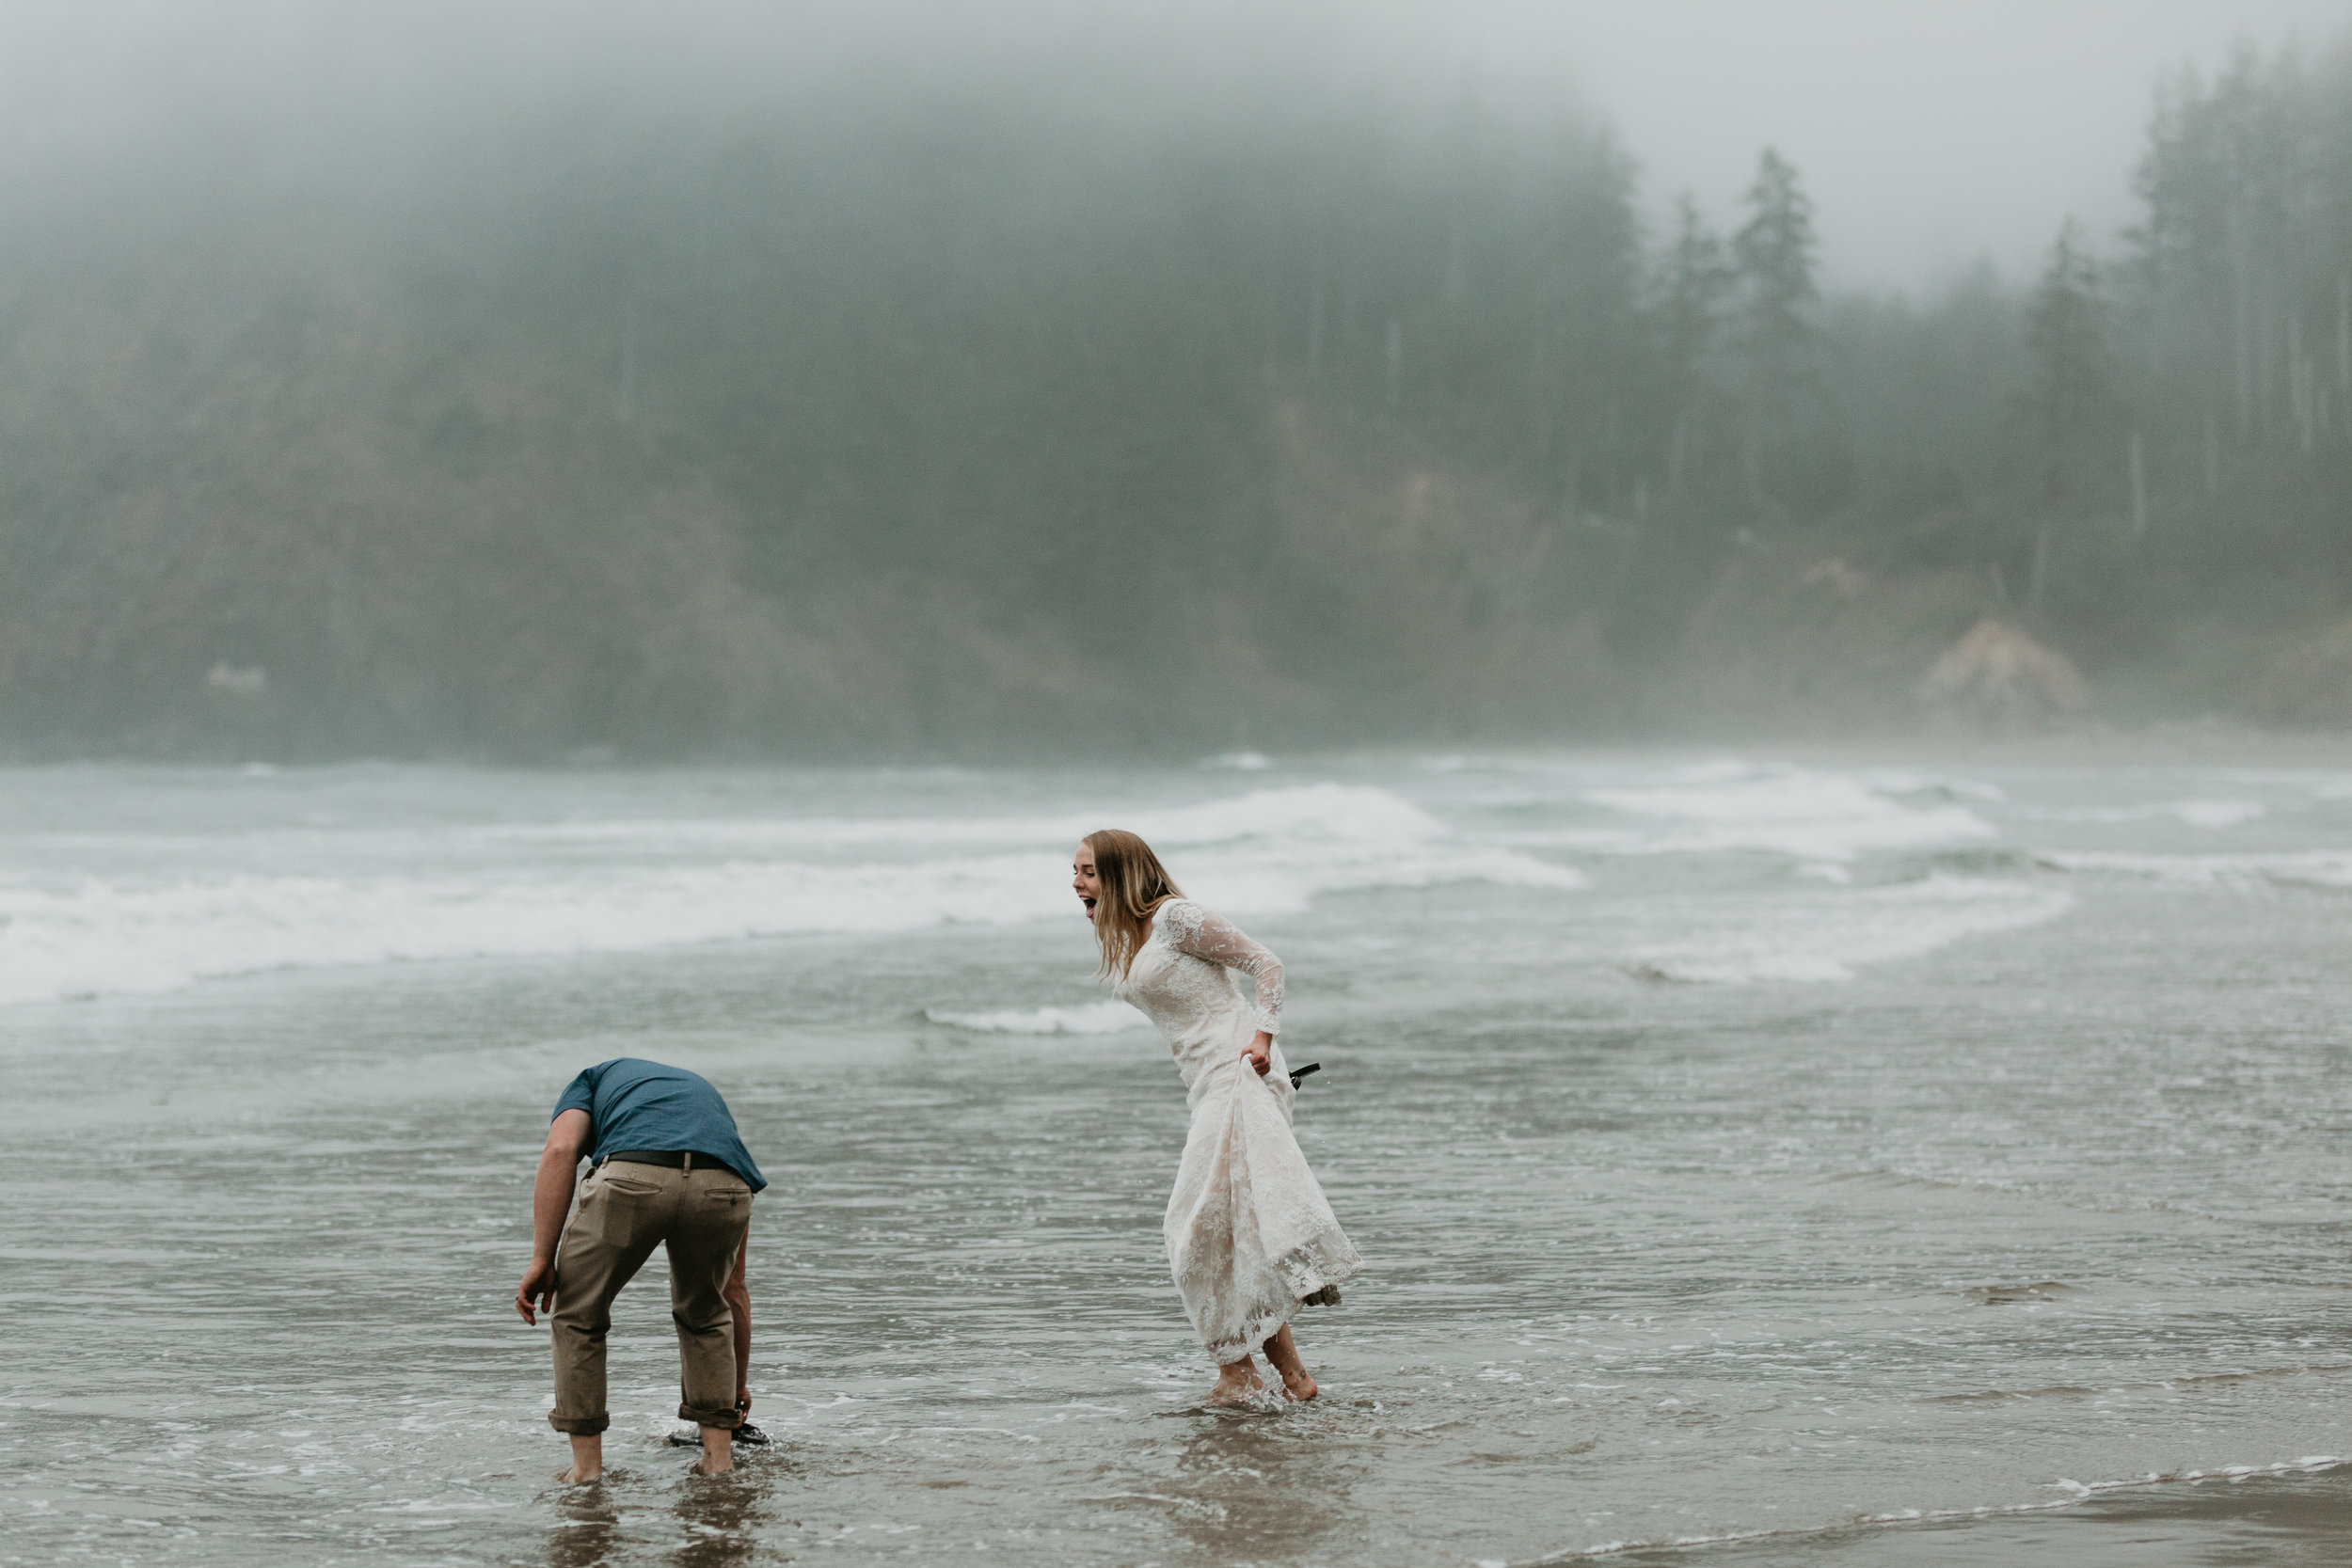 nicole-daacke-photography-ecola-state-park-oregon-elopement-bridal-photos-photographer-for-cannon-beach-elopement-oregon-coast-elopement-photographer-foggy-summer-elopement-cannon-beach-best-adventure-elopement-photographer-5667.jpg